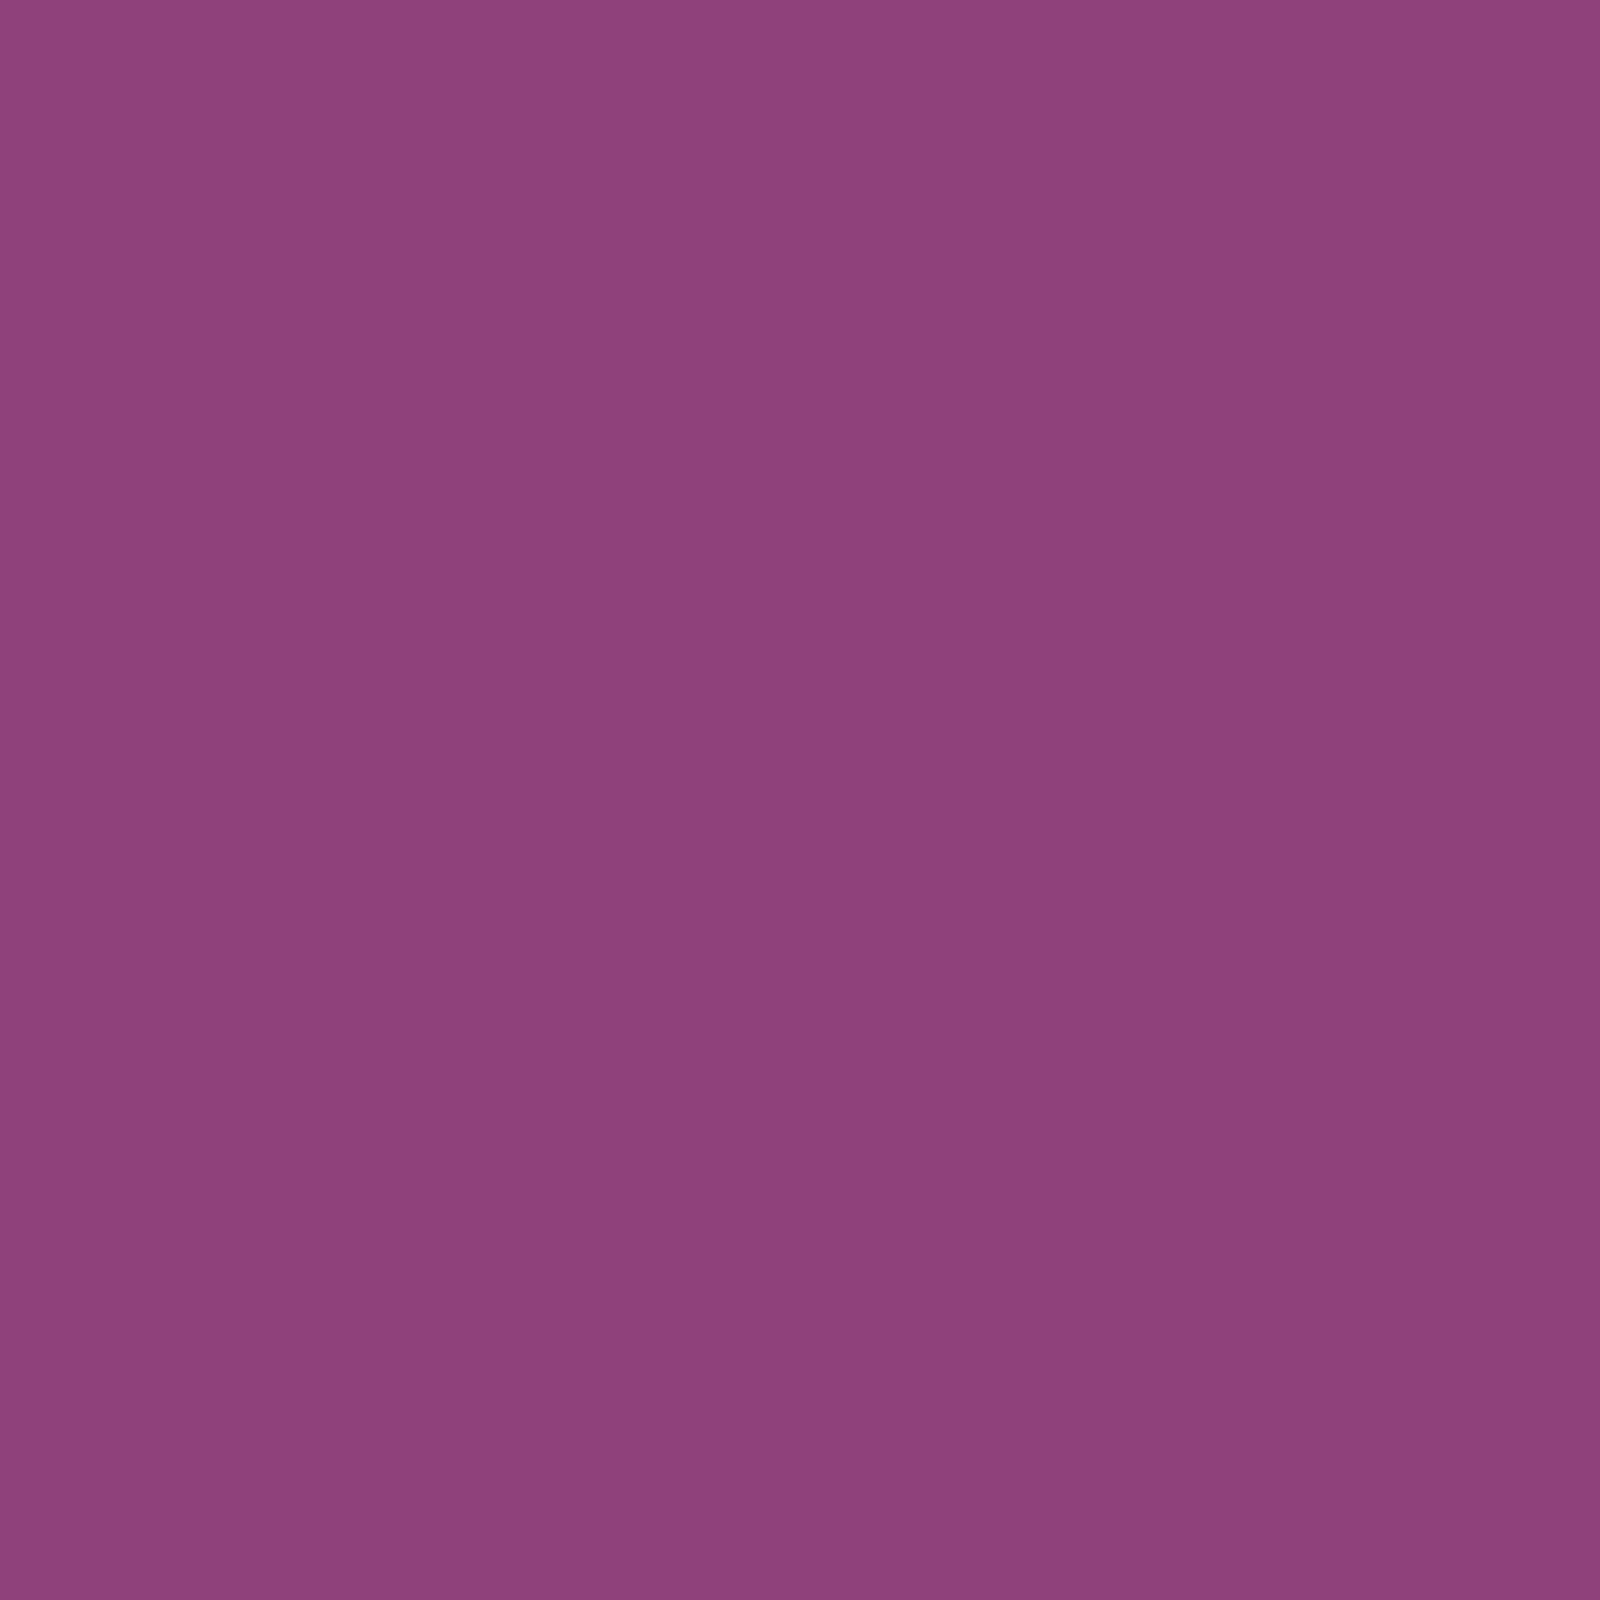 Tula Pink Designer Essentials Solids - Dragon's Breath - Amethyst